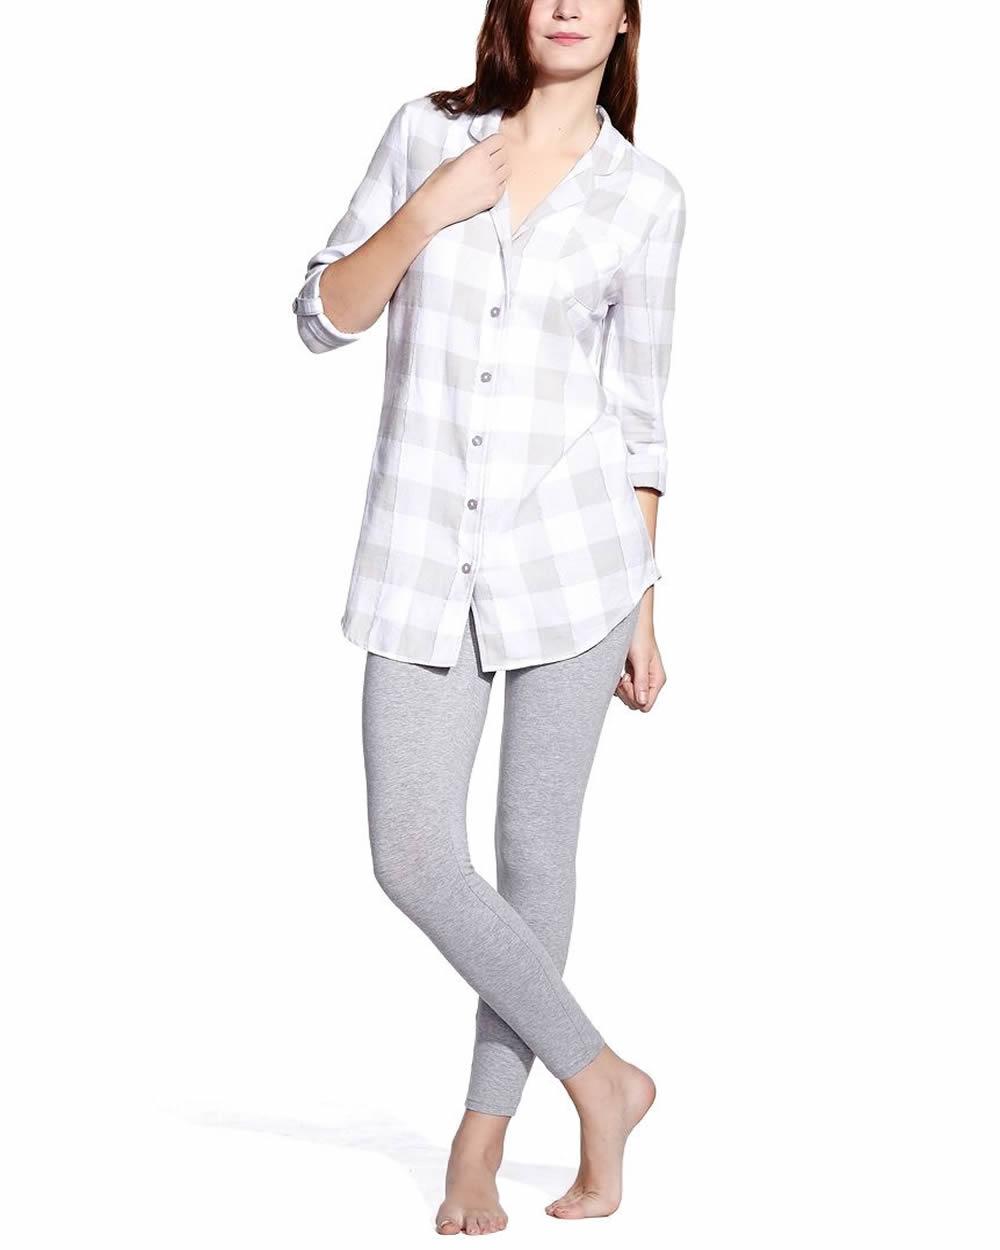 ensemble pyjama avec legging femmes reitmans. Black Bedroom Furniture Sets. Home Design Ideas